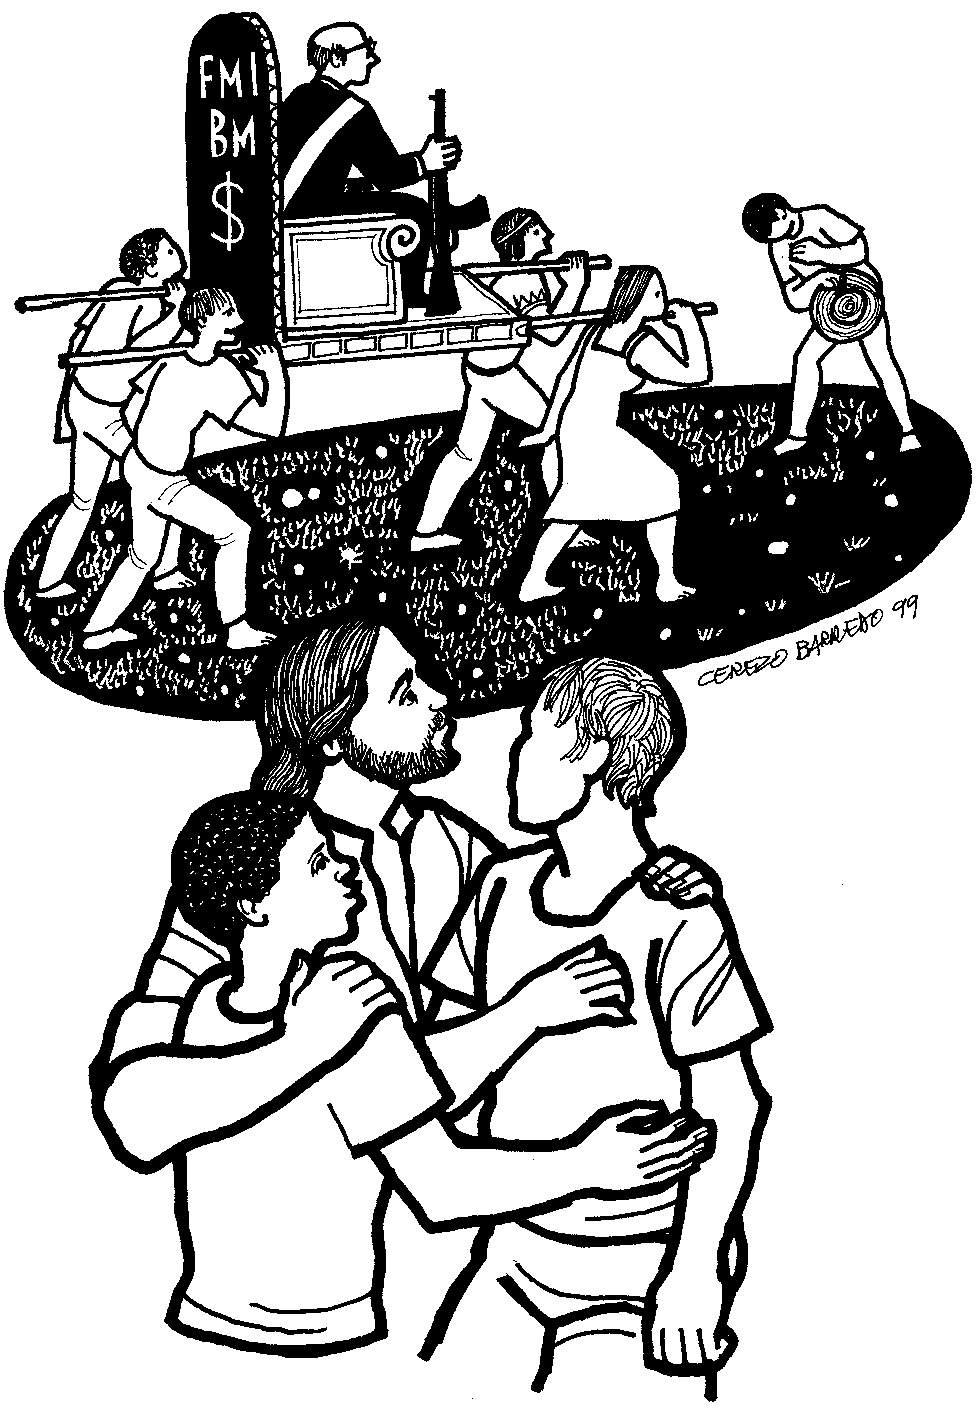 http://servicioskoinonia.org/cerezo/dibujosB/58ordinarioB29.jpg